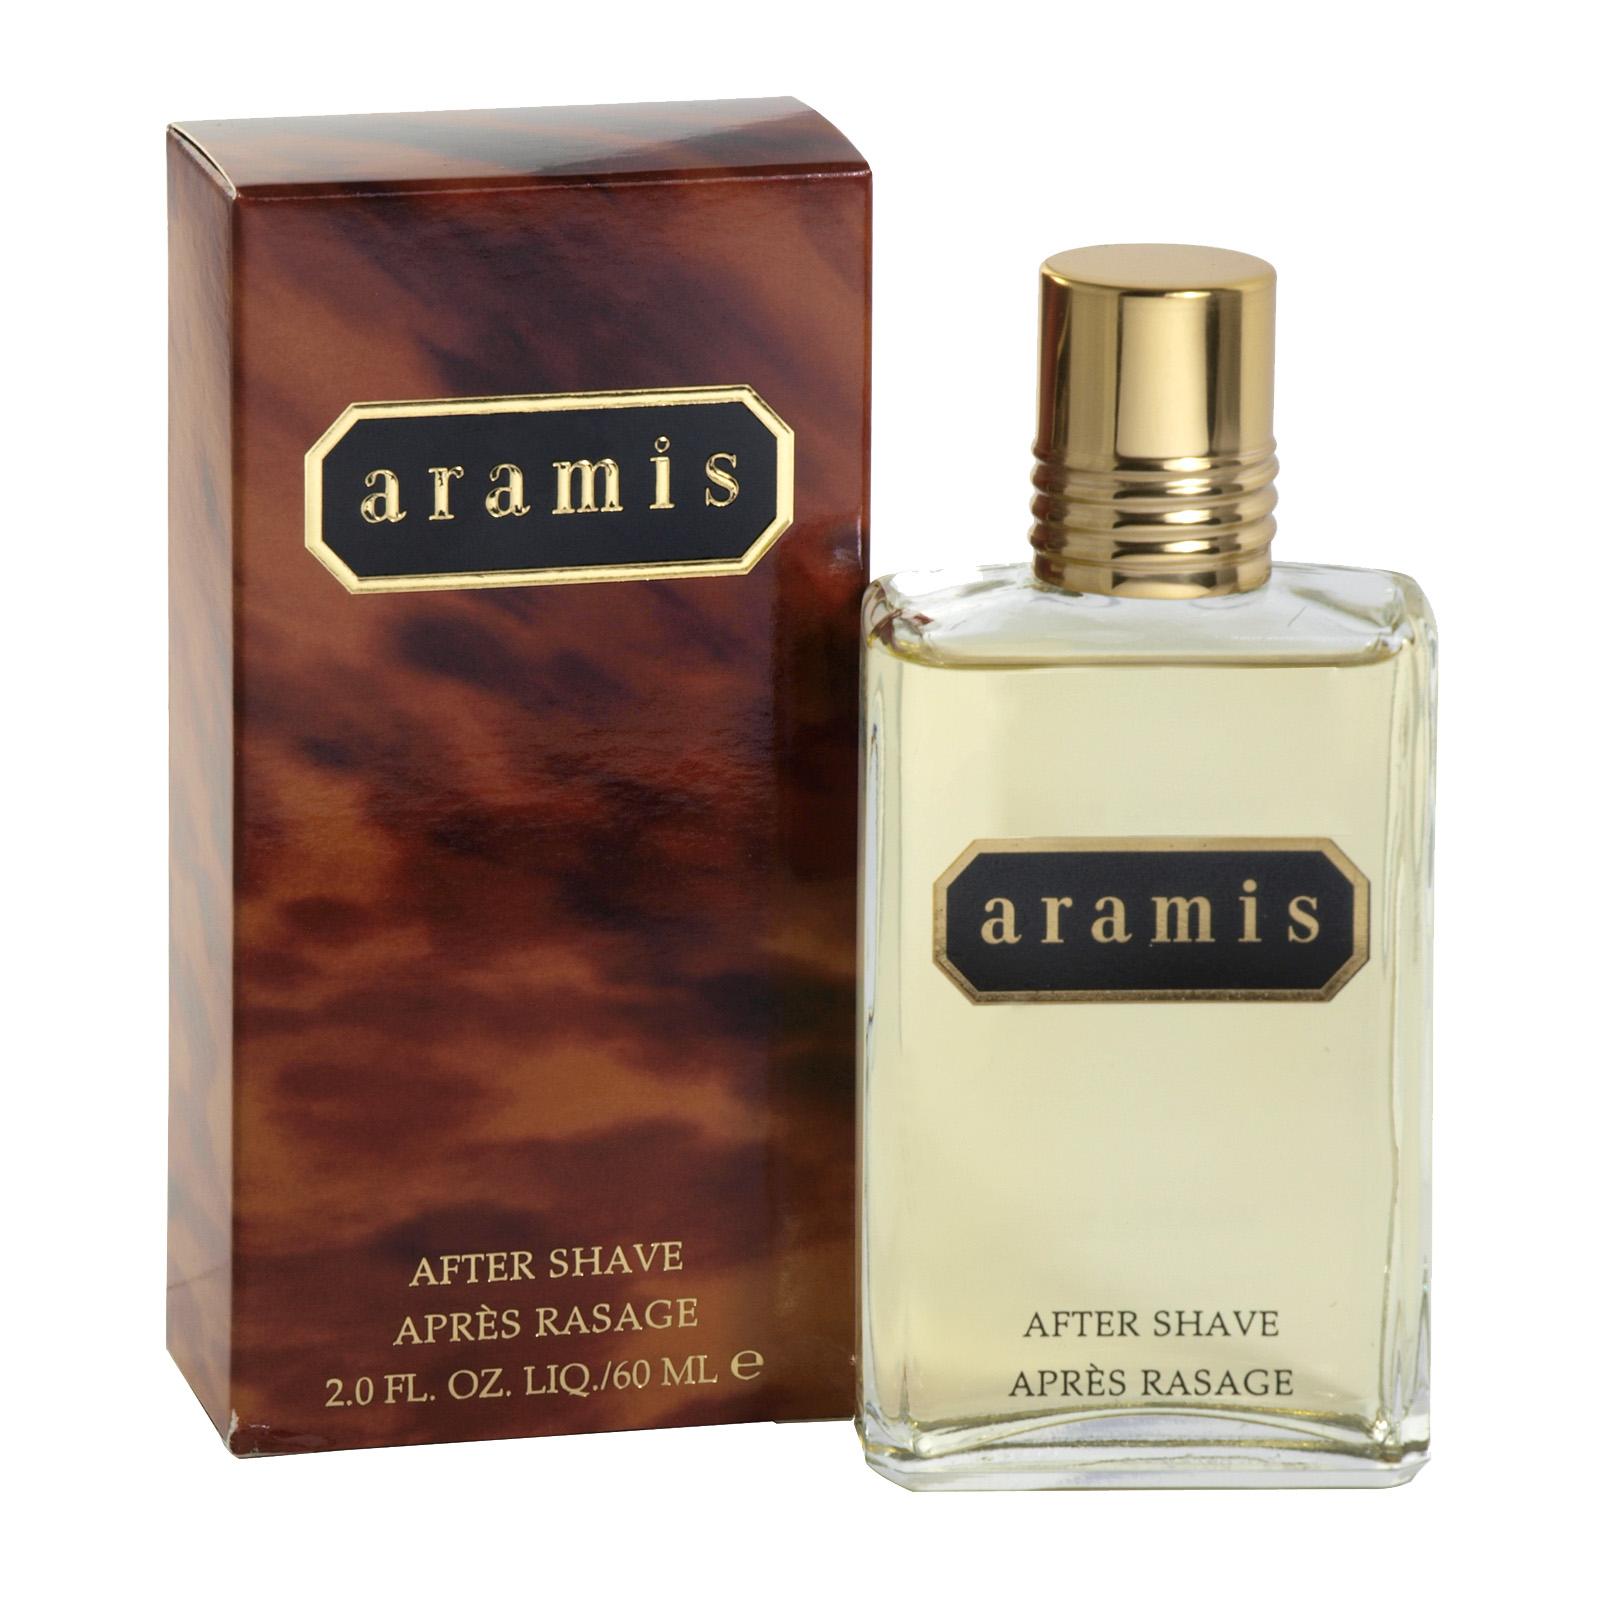 ARAMIS 60ML AFTERSHAVE